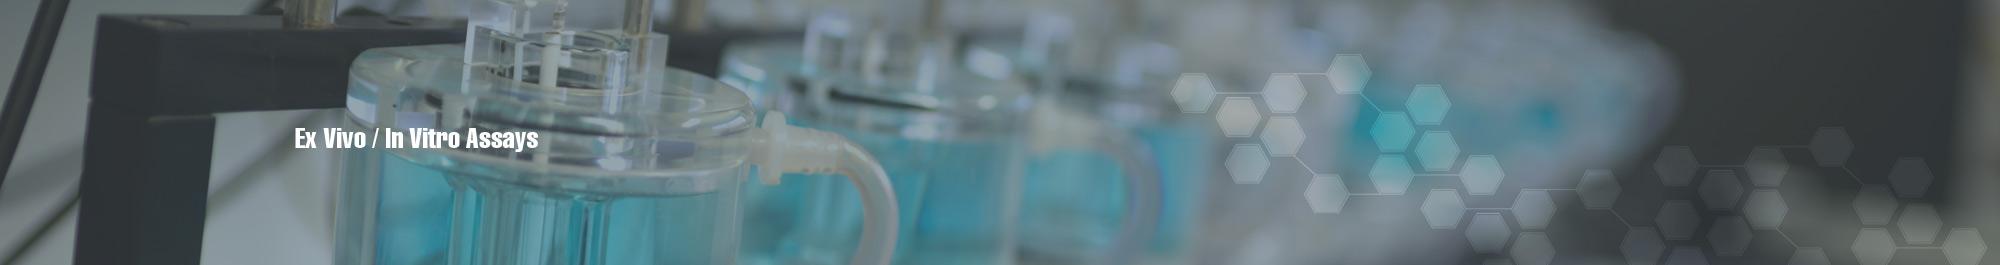 ex vivo in vitro assays